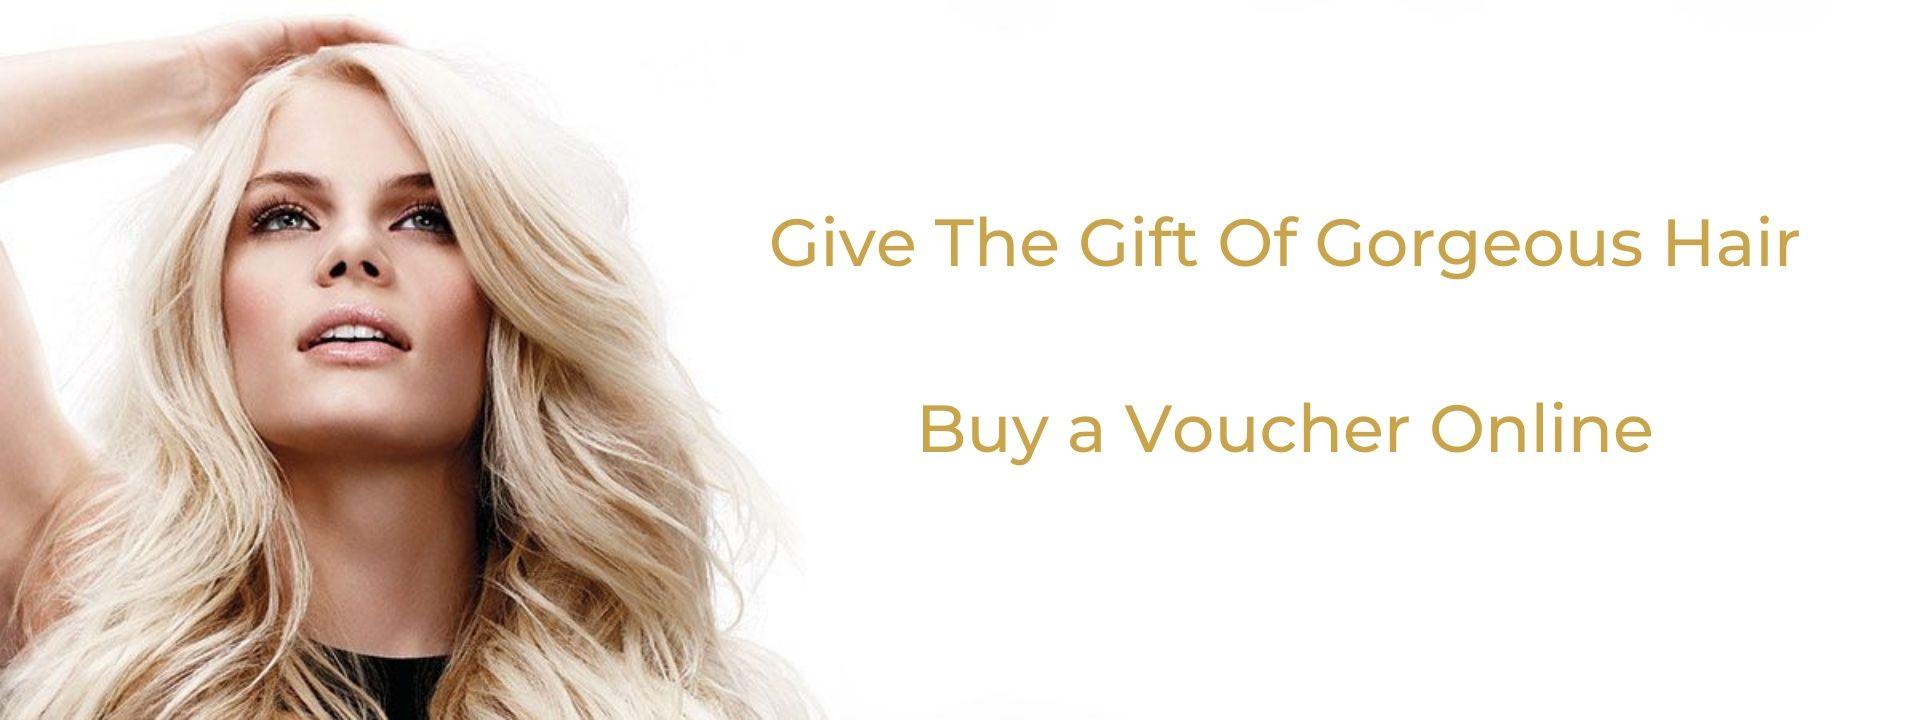 Online Gift Vouchers at Esente Hair Salon in Wimbledon